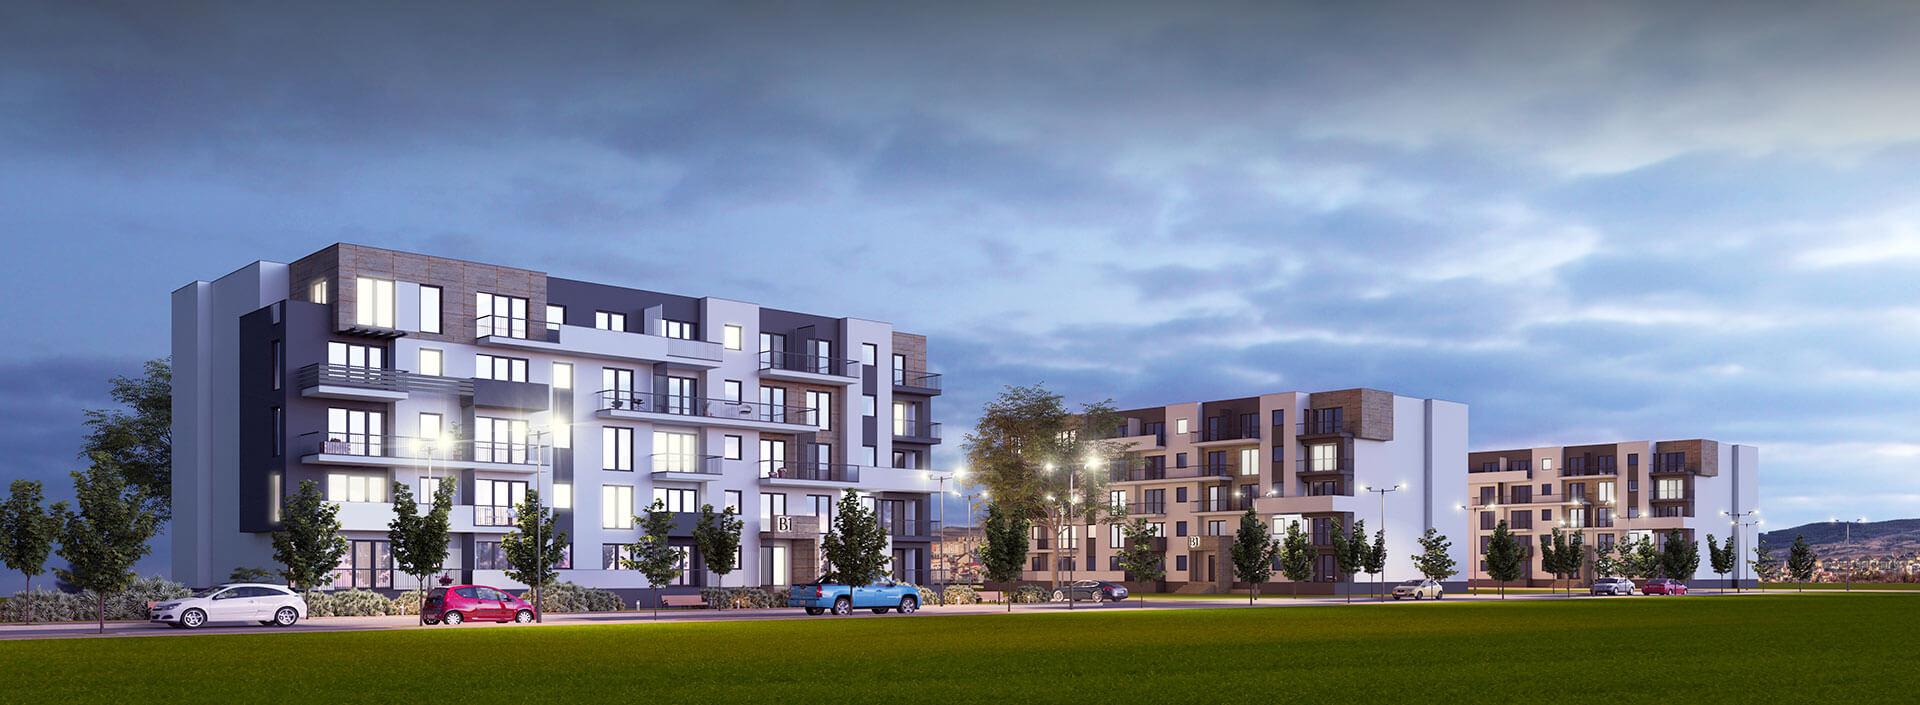 Care sunt avantajele unui apartament cu 4 camere in Constanta?